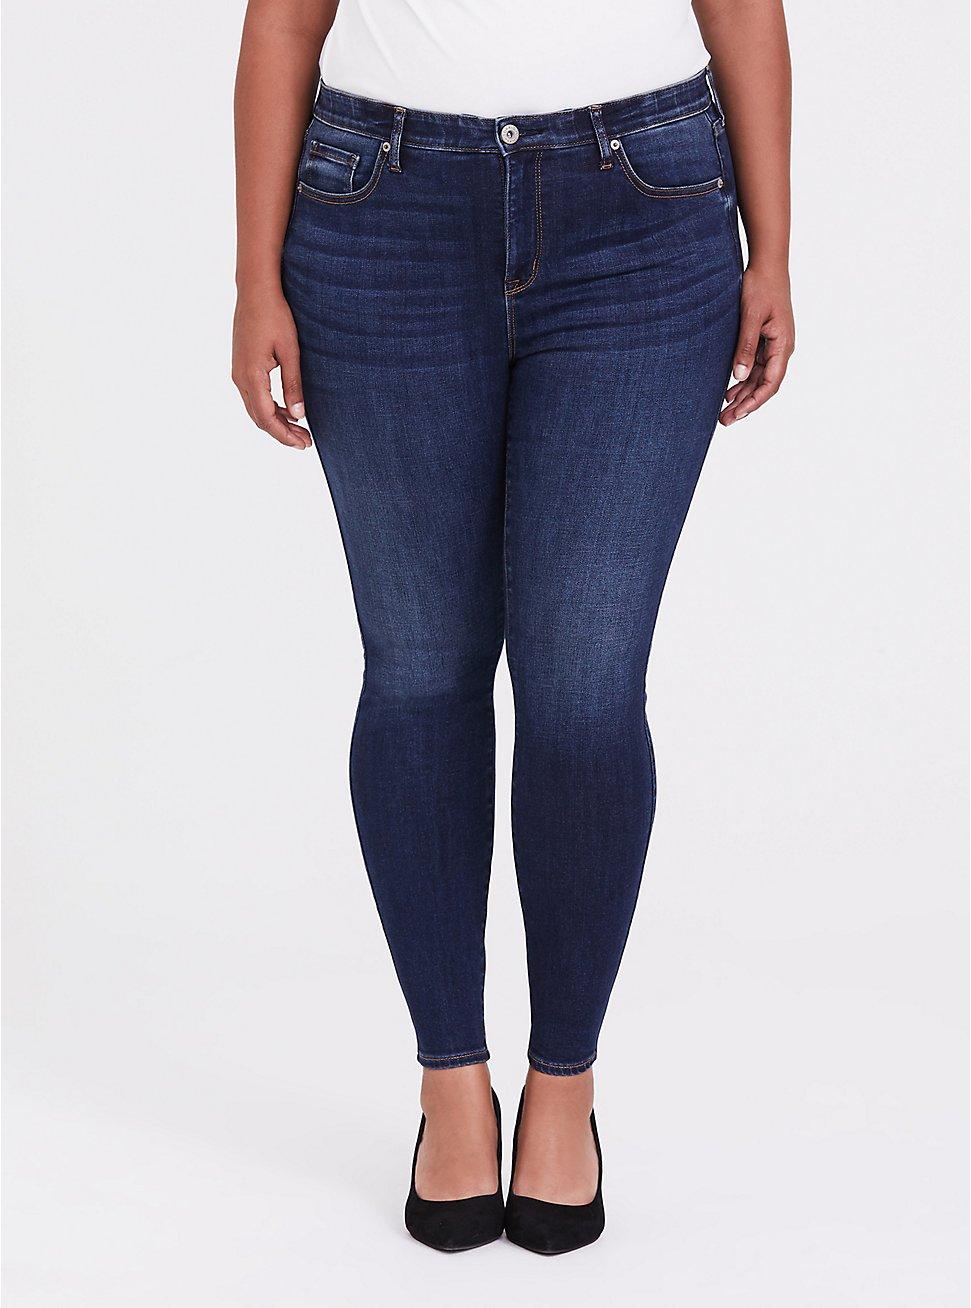 Sky High Skinny Jean - Comfort Stretch Dark Wash, JINX, hi-res